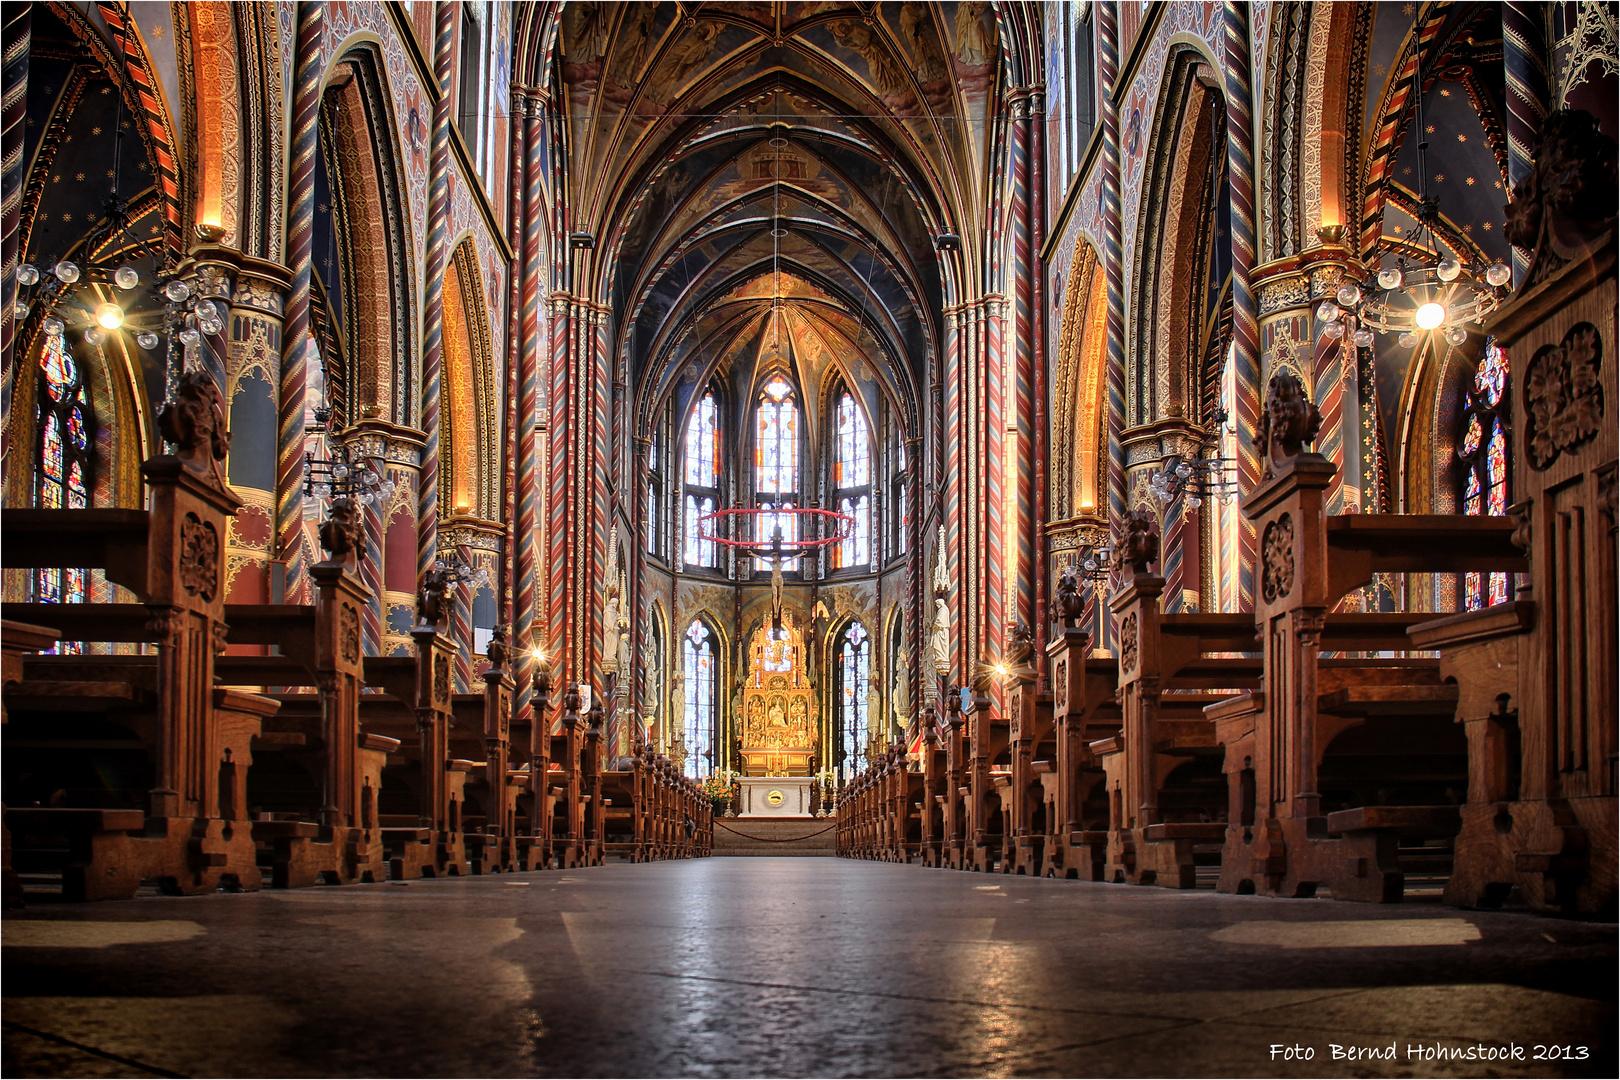 Marienwallfahrtskirche in Kevelaer ....